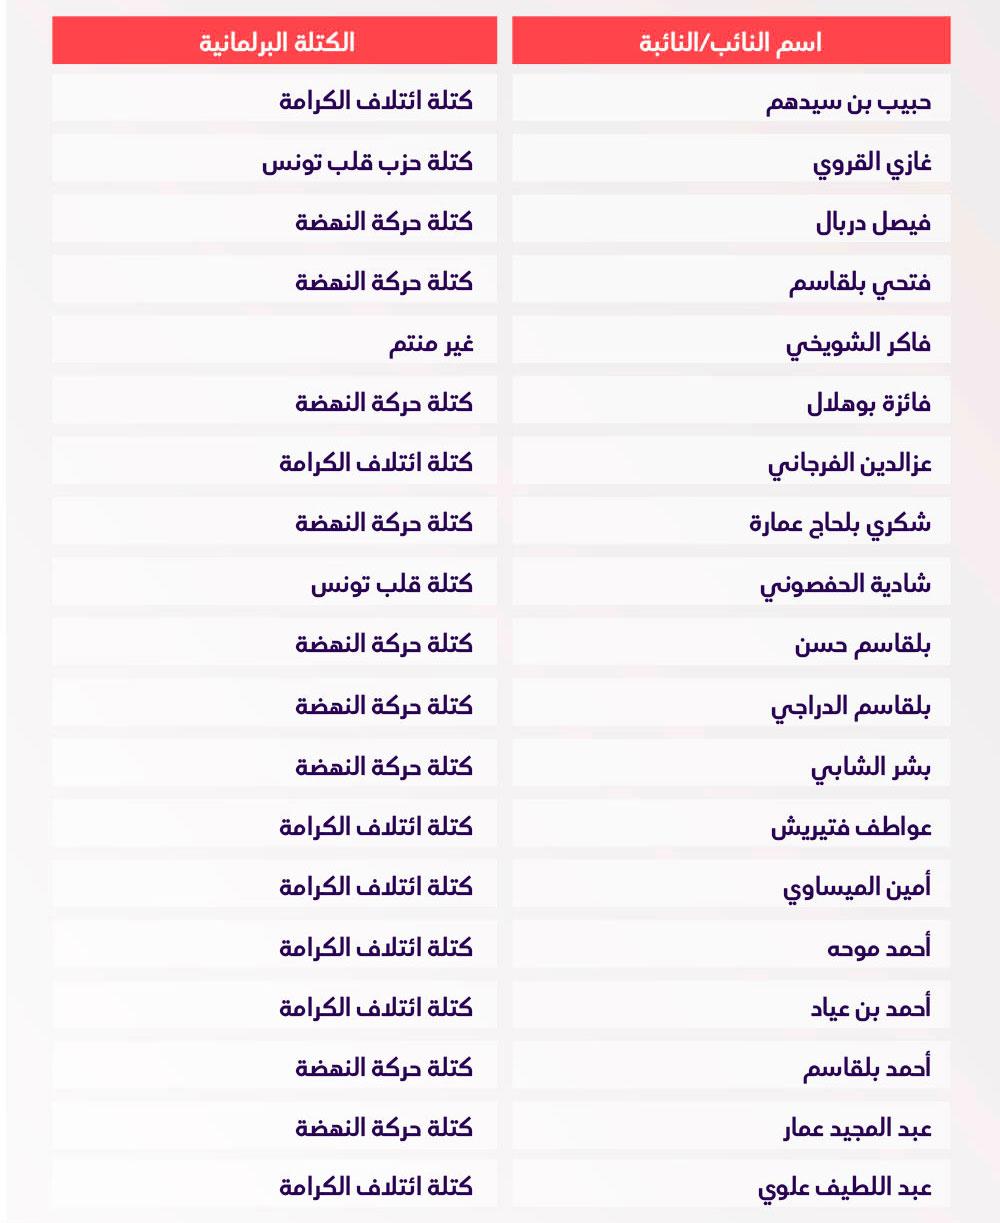 vote-bawsala-300720--10.jpg